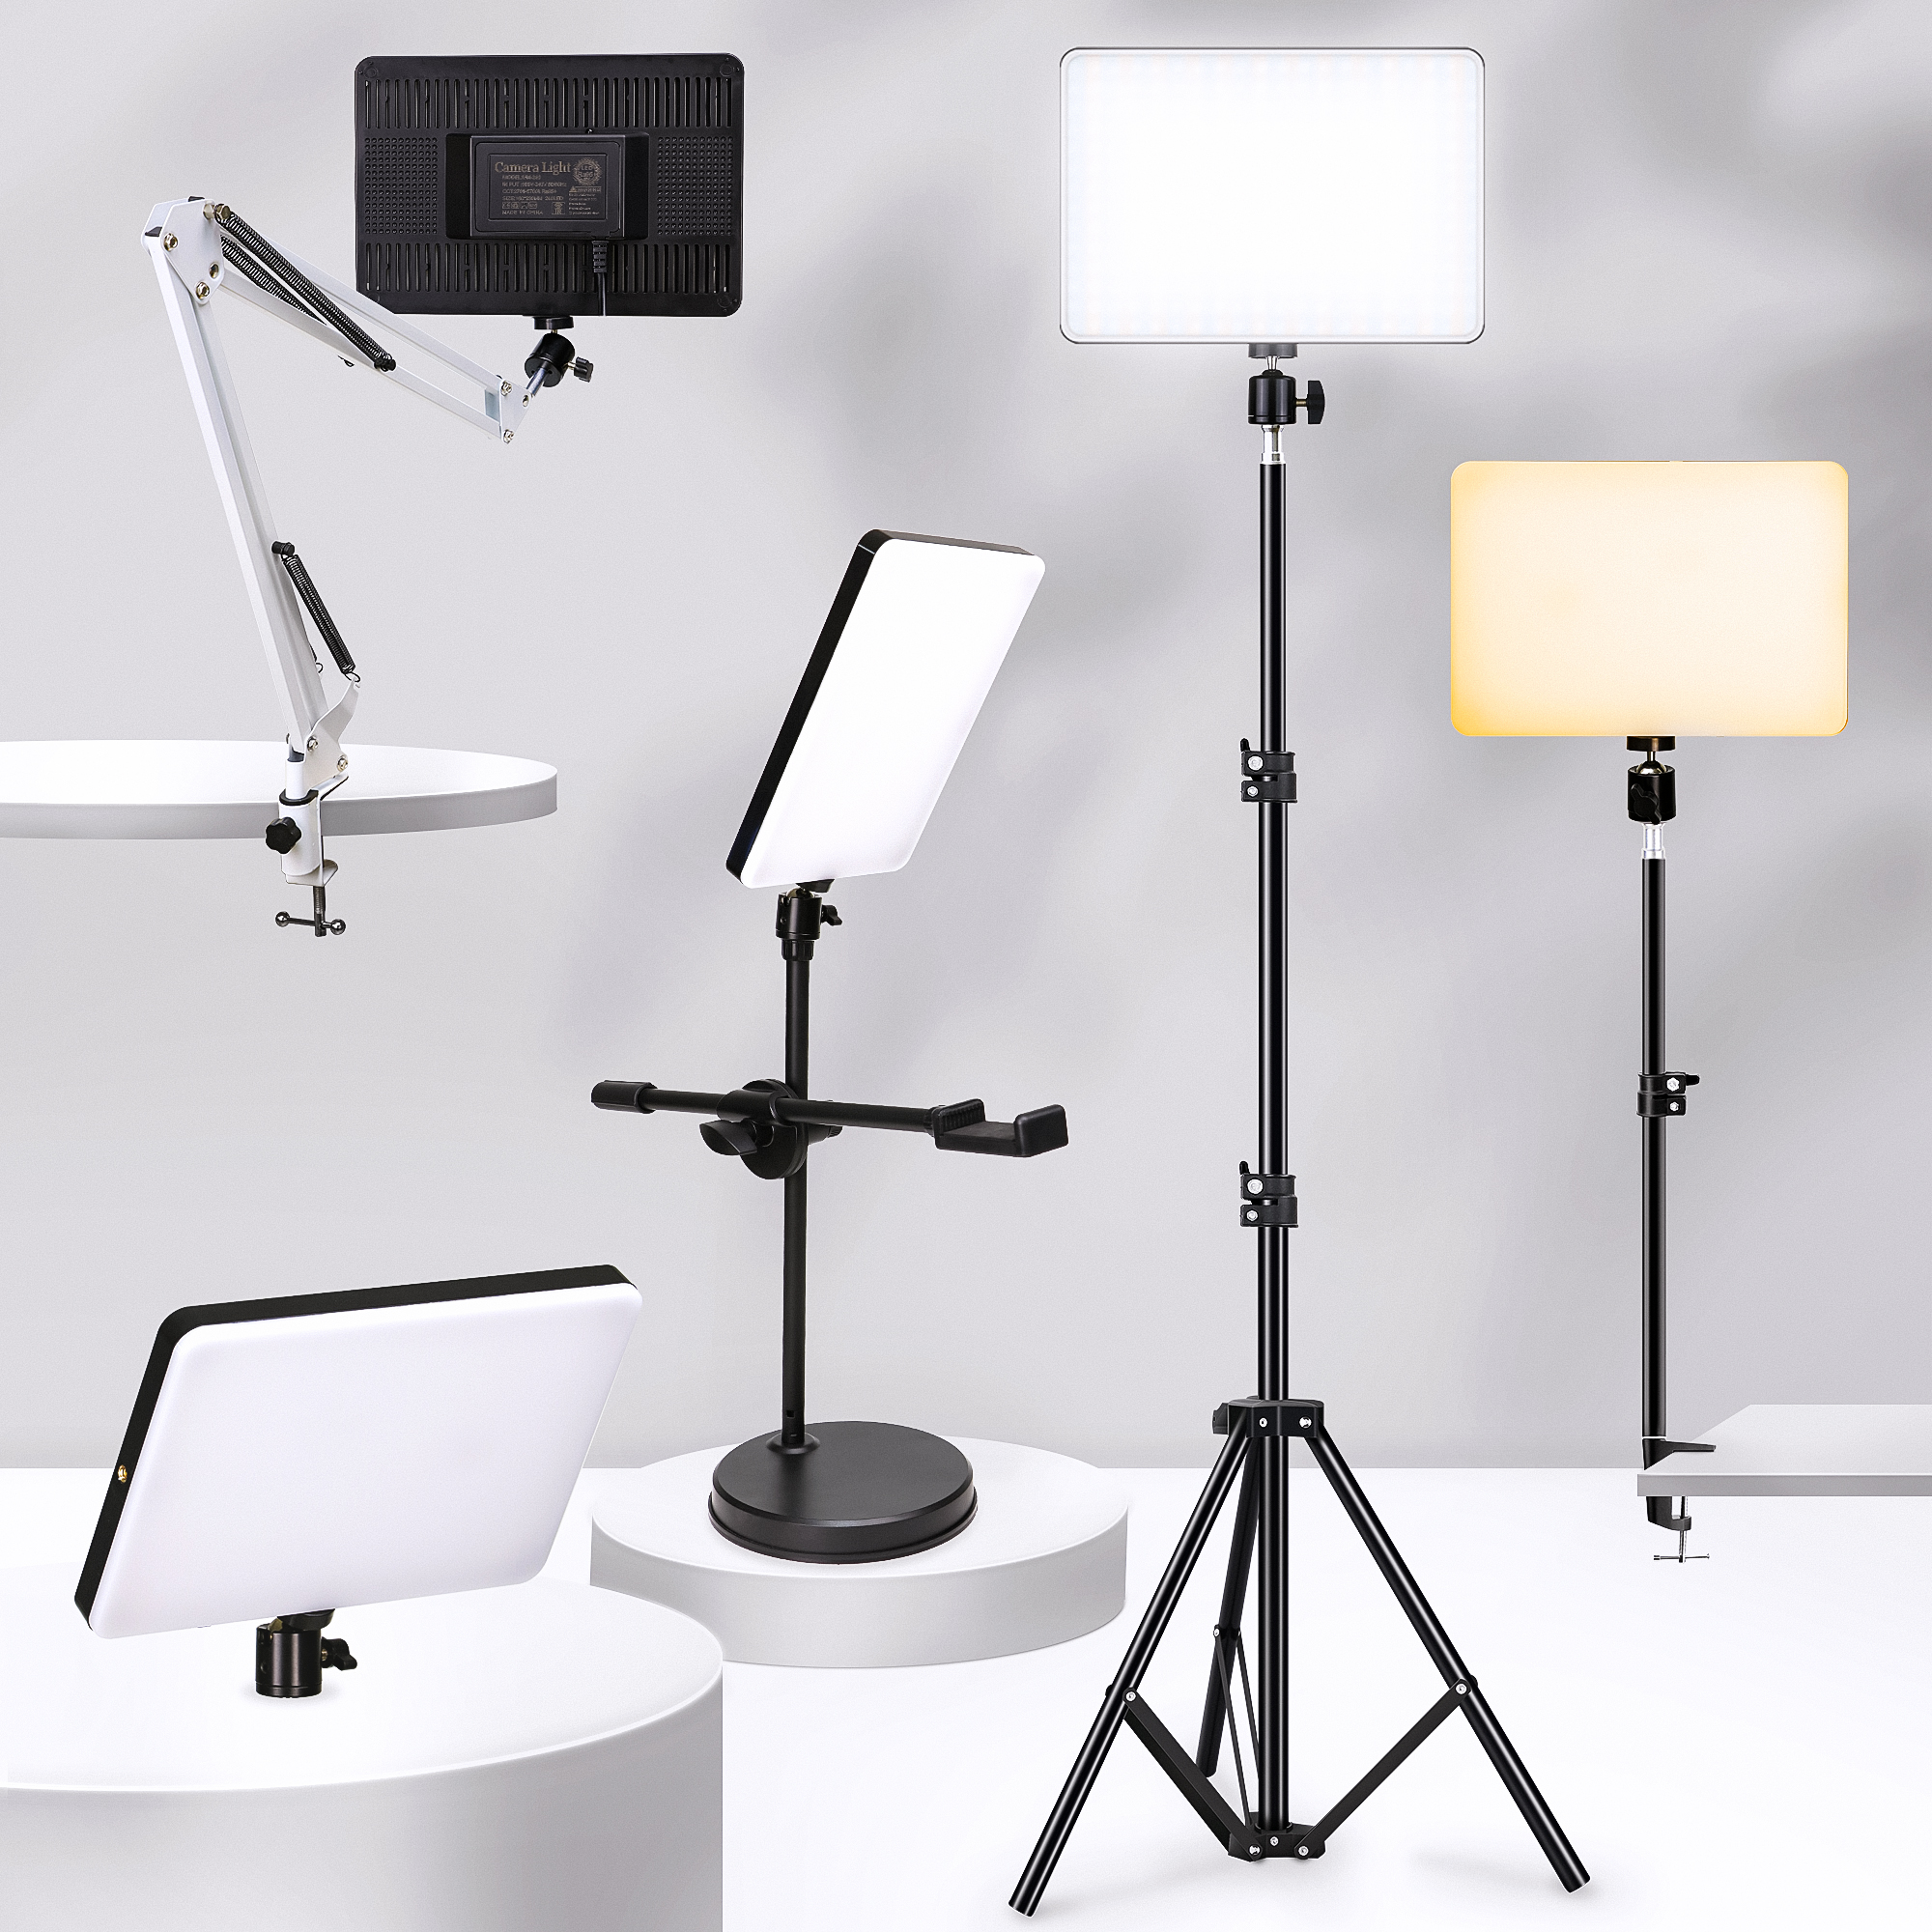 Dimmable LED Video Light Panel EU Plug 2700k 5700k Photography Lighting For Live Stream Photo Studio Home v7 VC